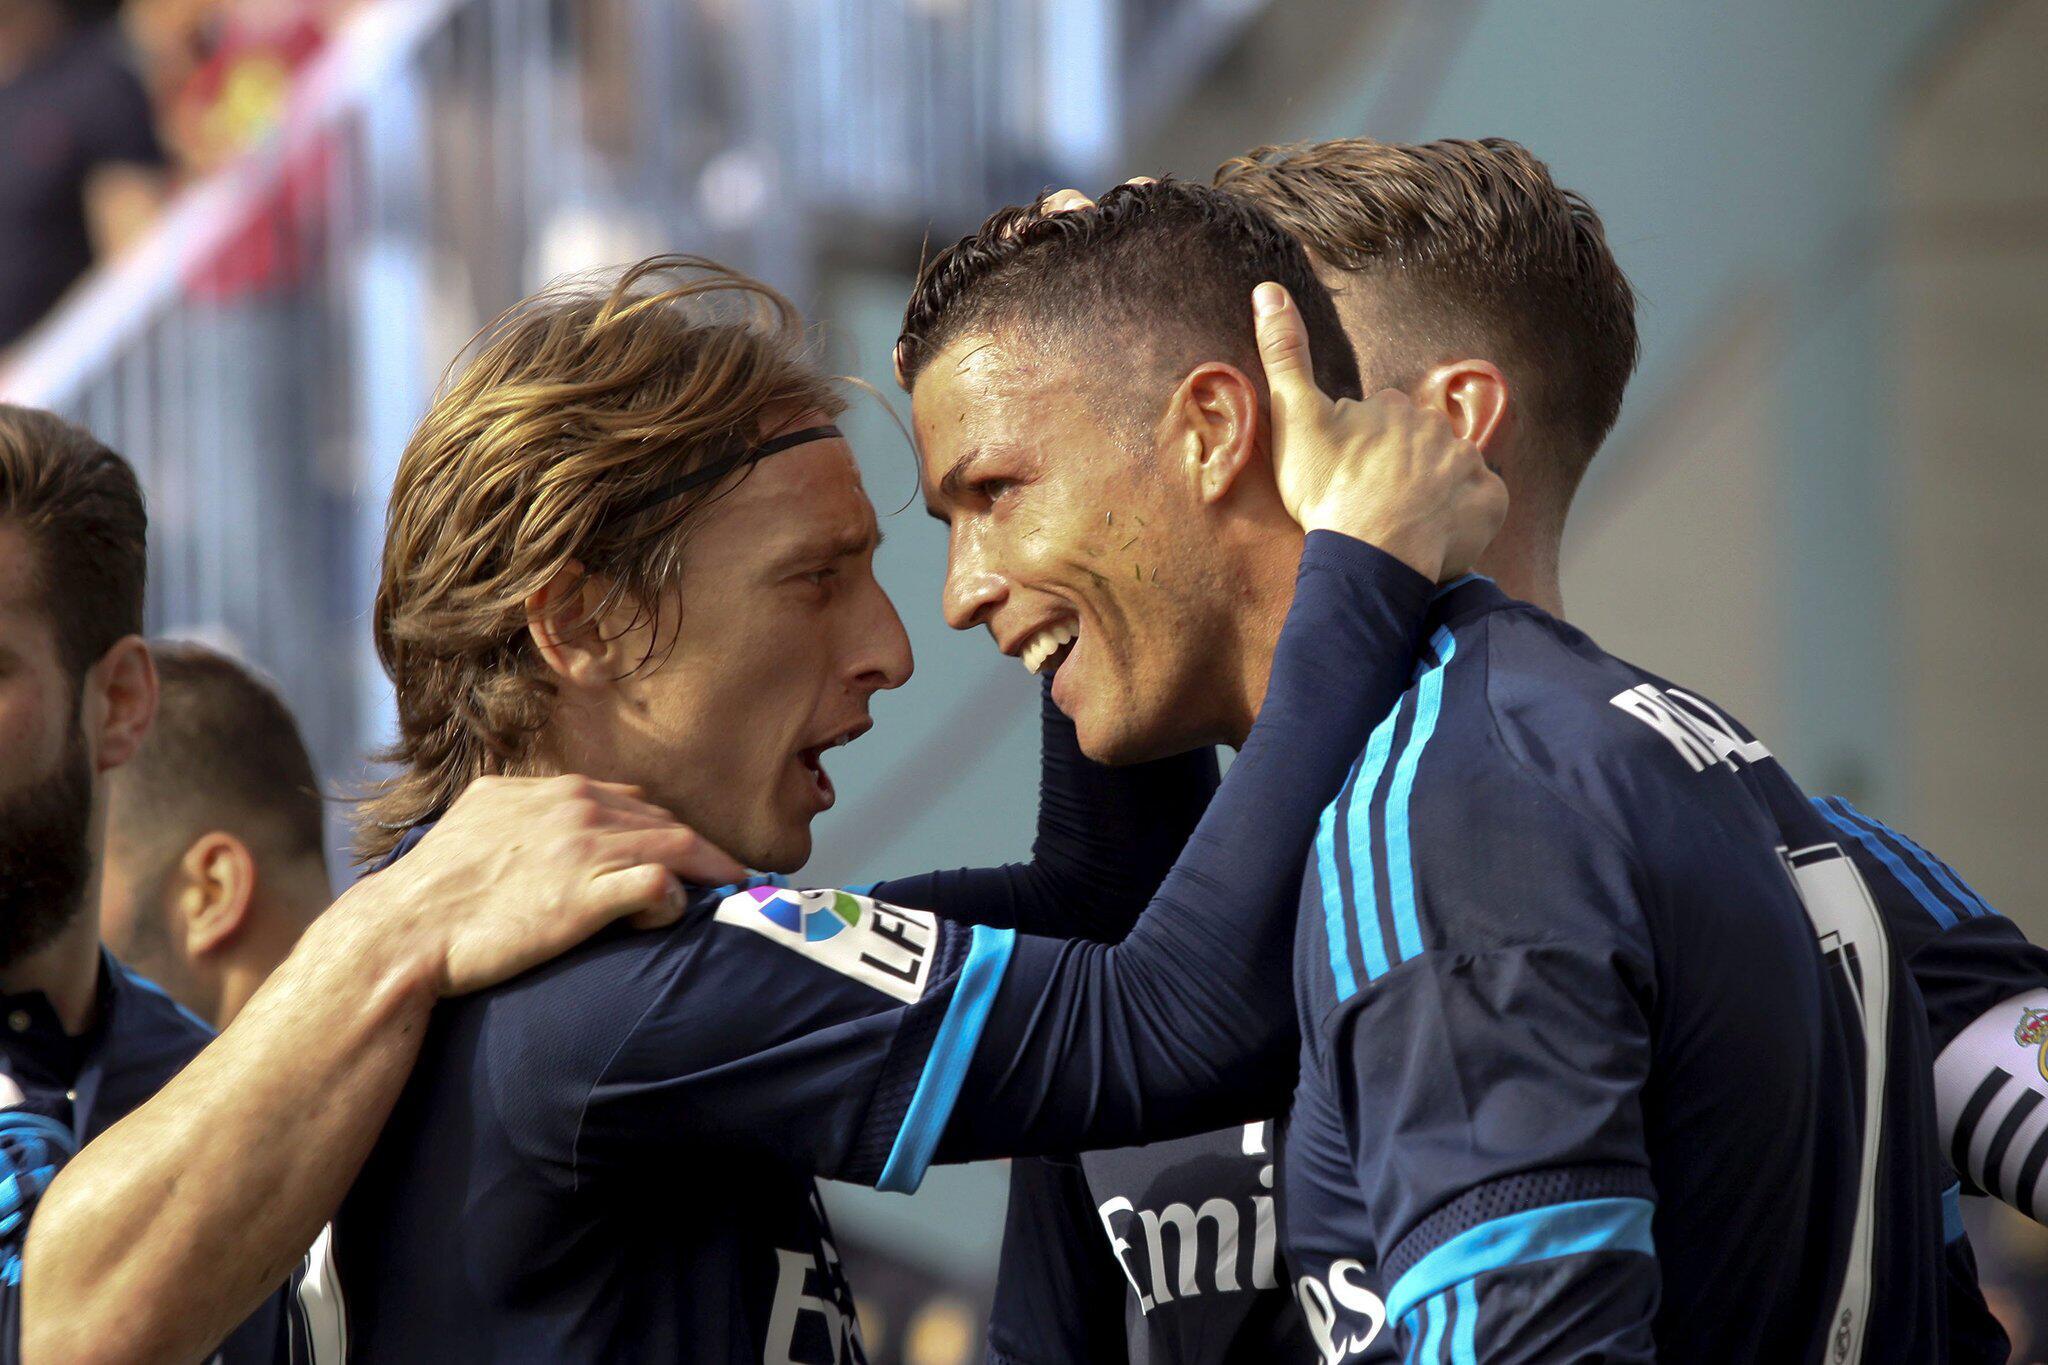 Bild zu Cristiano Ronaldo und Luka Modric